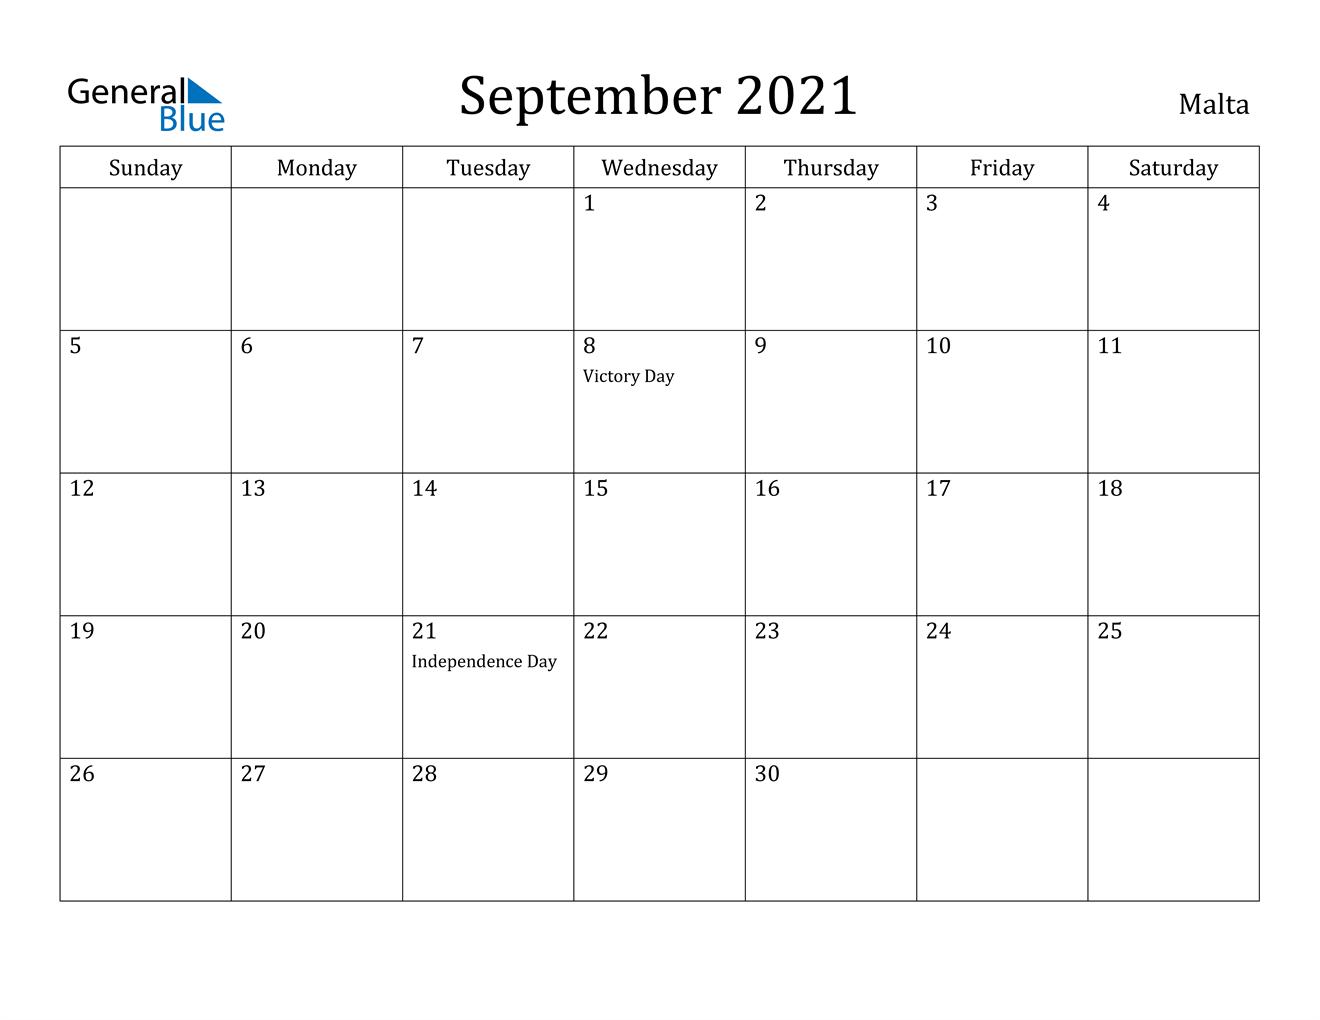 September 2021 Calendar - Malta